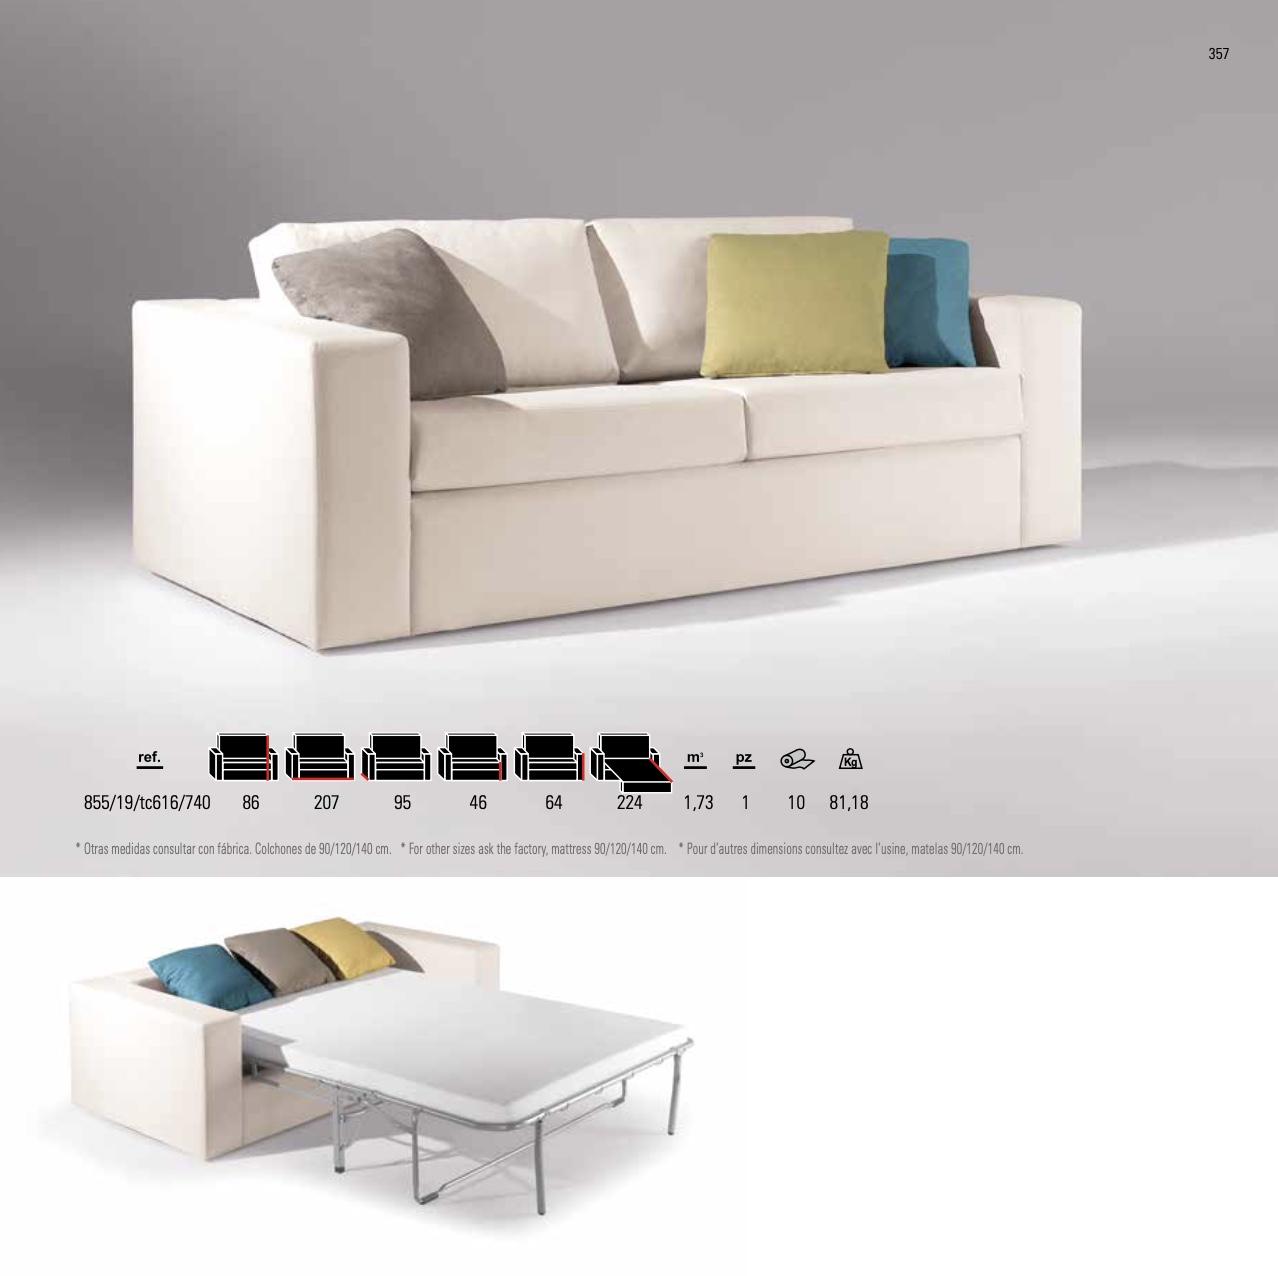 TM-Sofas-Camas-20